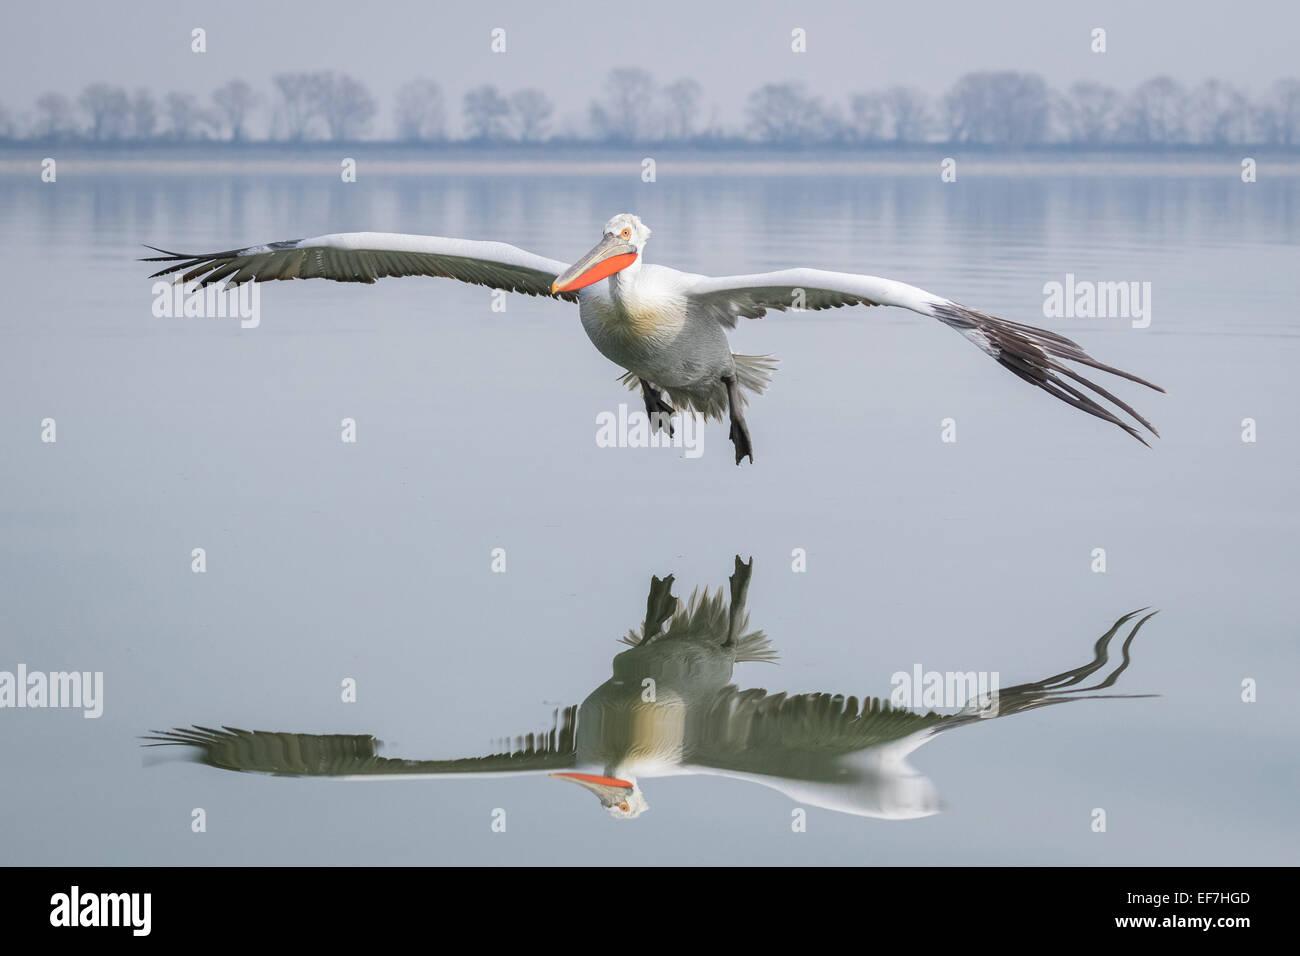 Dalmatian Pelican (Pelecanus crispus) comes into land on a very still Lake Kerkini in Northern Greece, its reflection - Stock Image